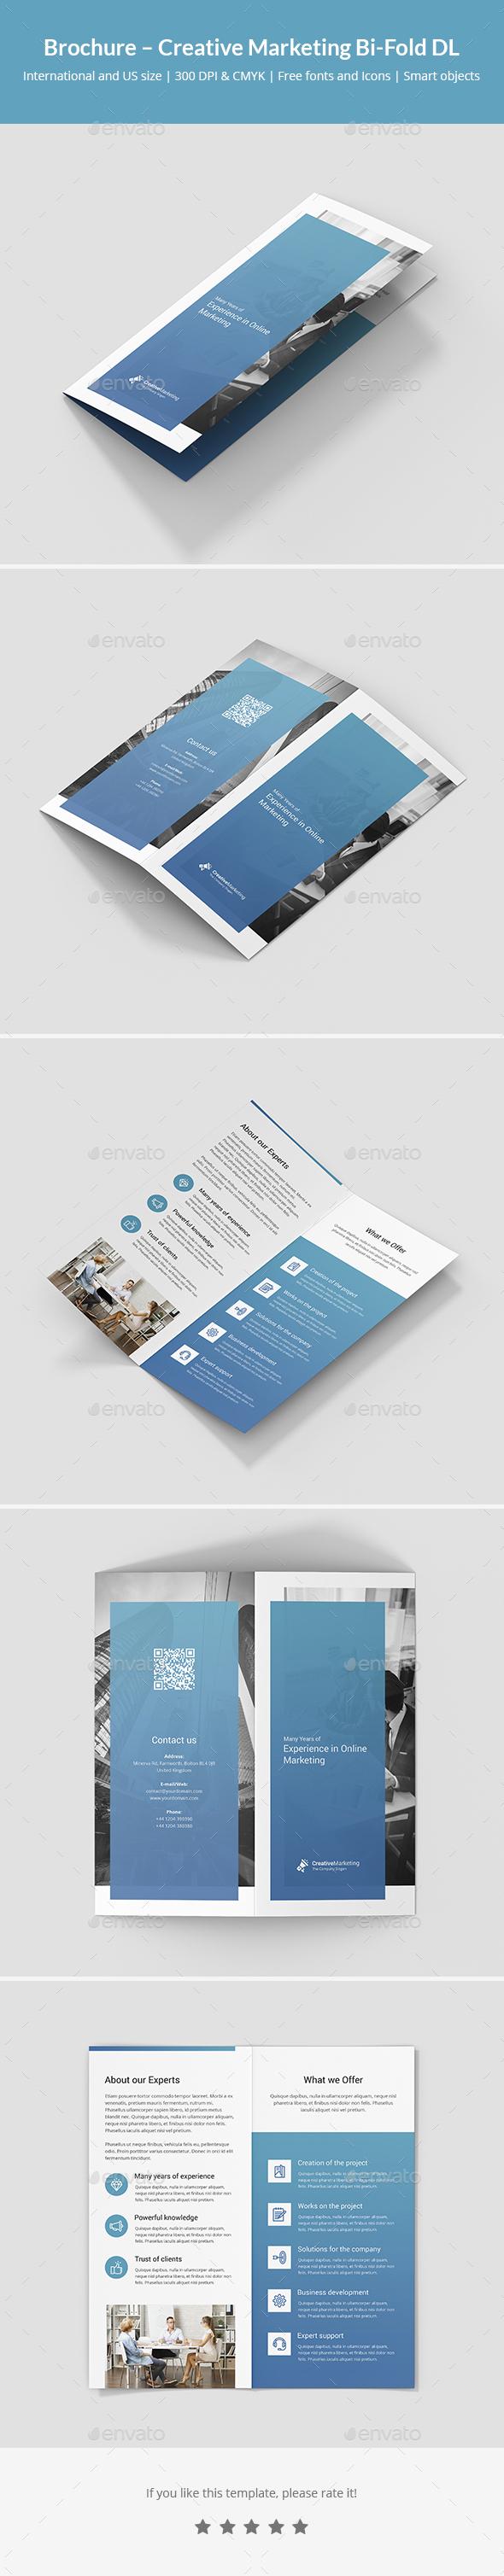 Brochure – Creative Marketing Bi-Fold DL - Corporate Brochures